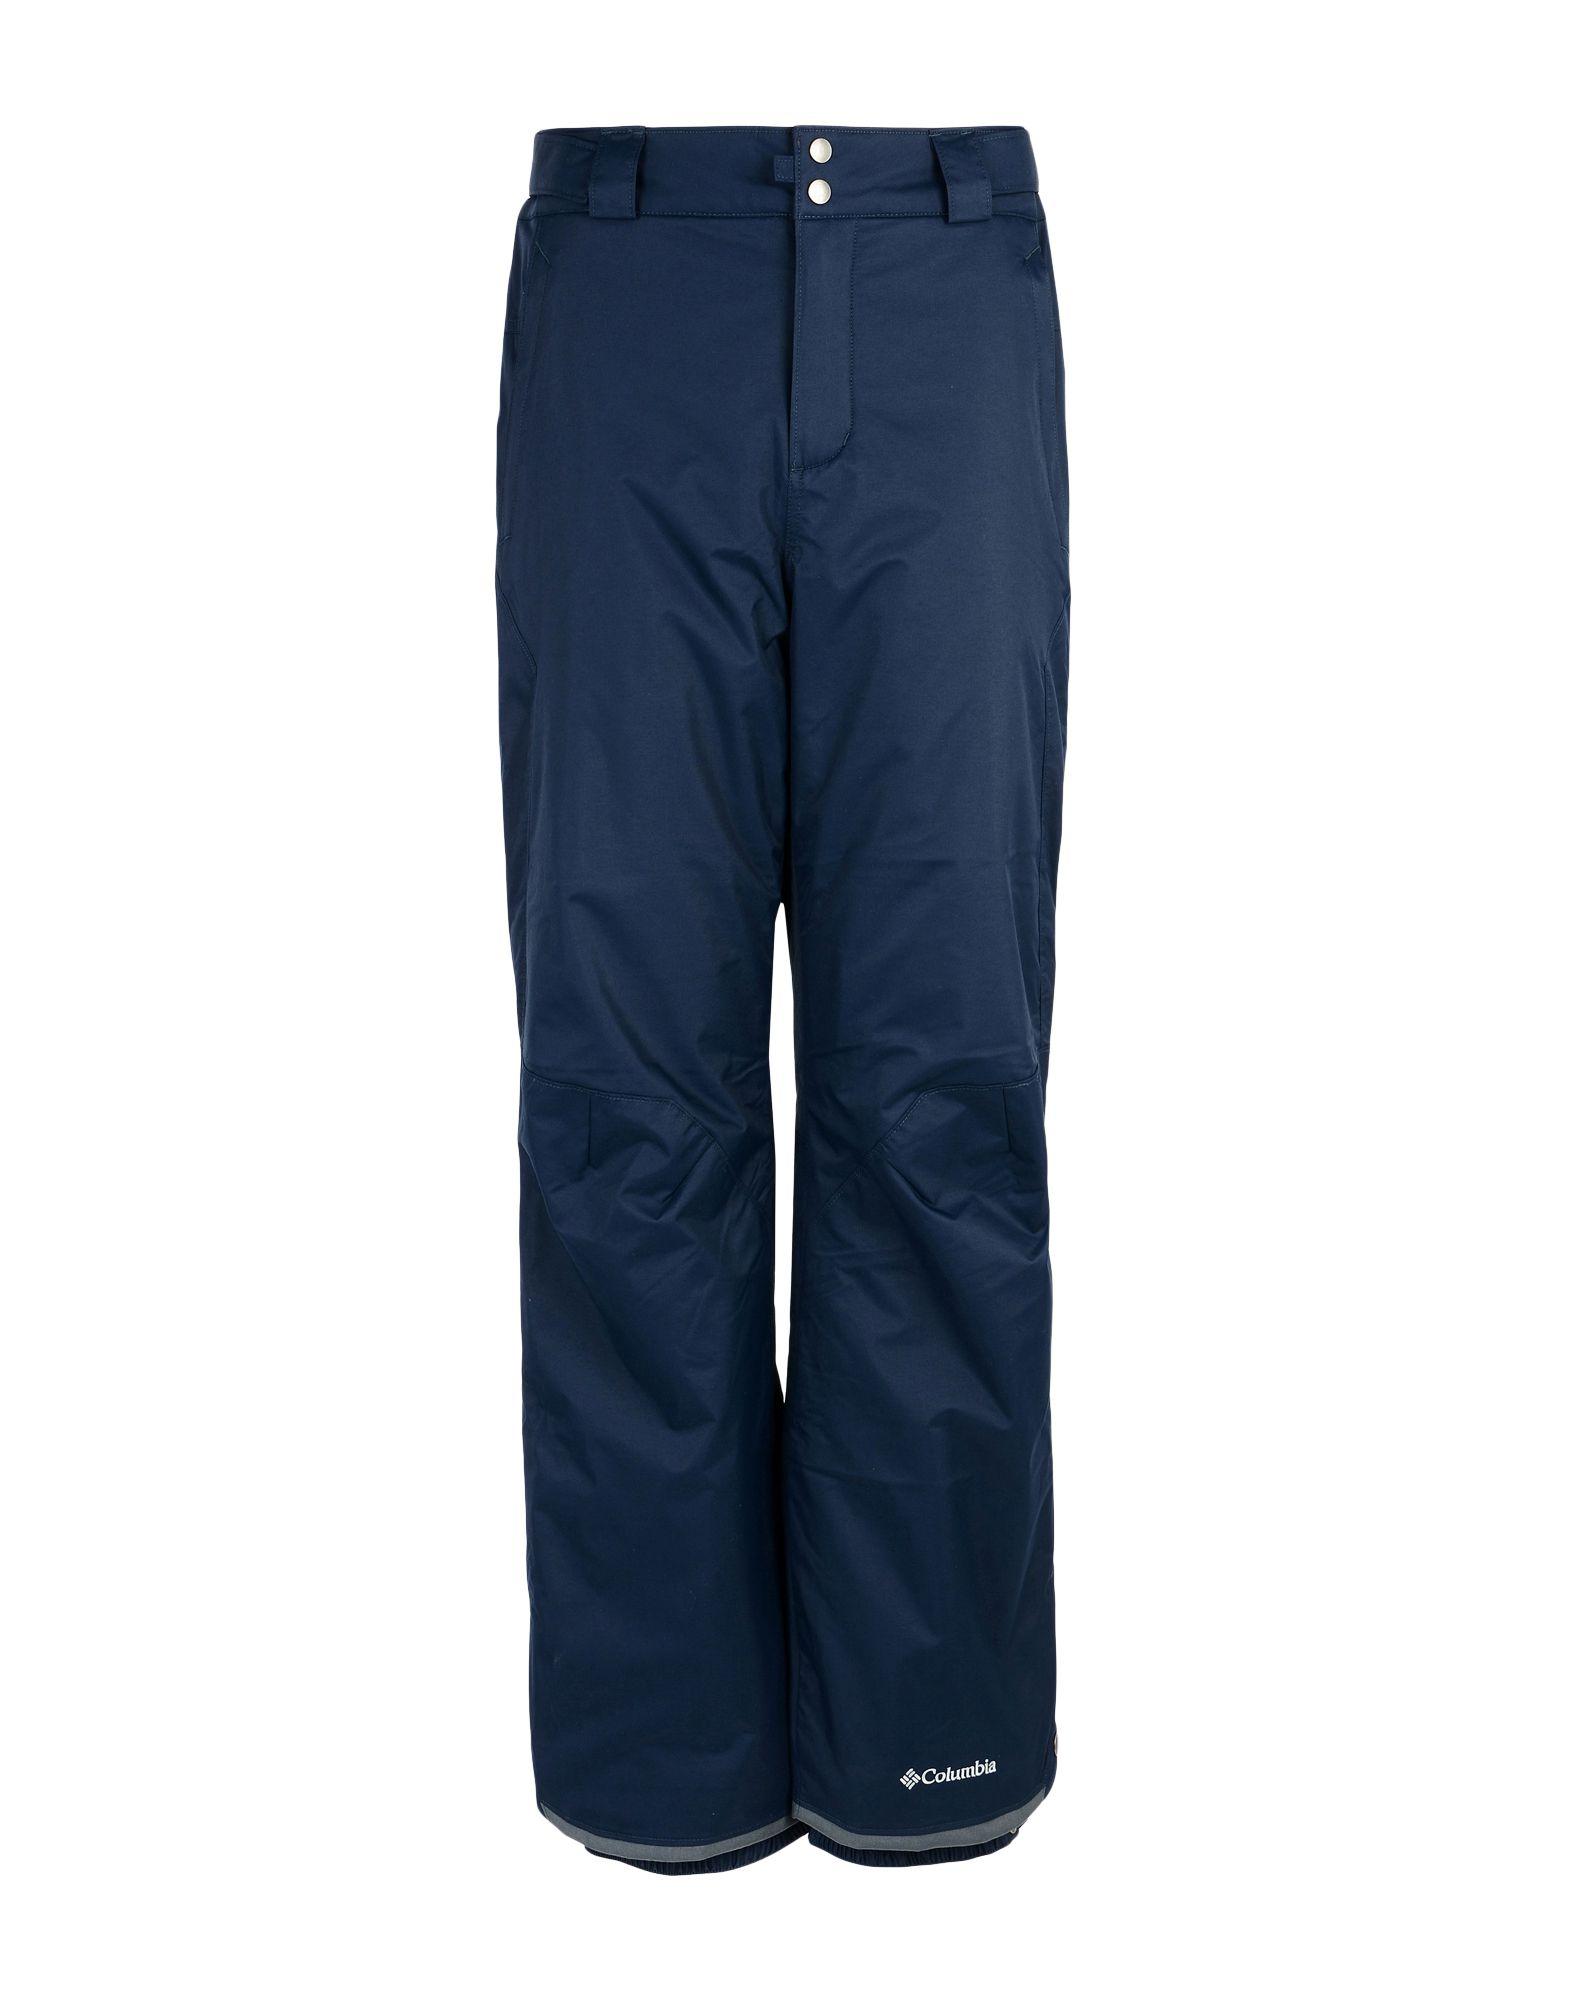 Pantalone Sportivo Columbia Bugaboo™ Ii Pant - Uomo - Acquista online su